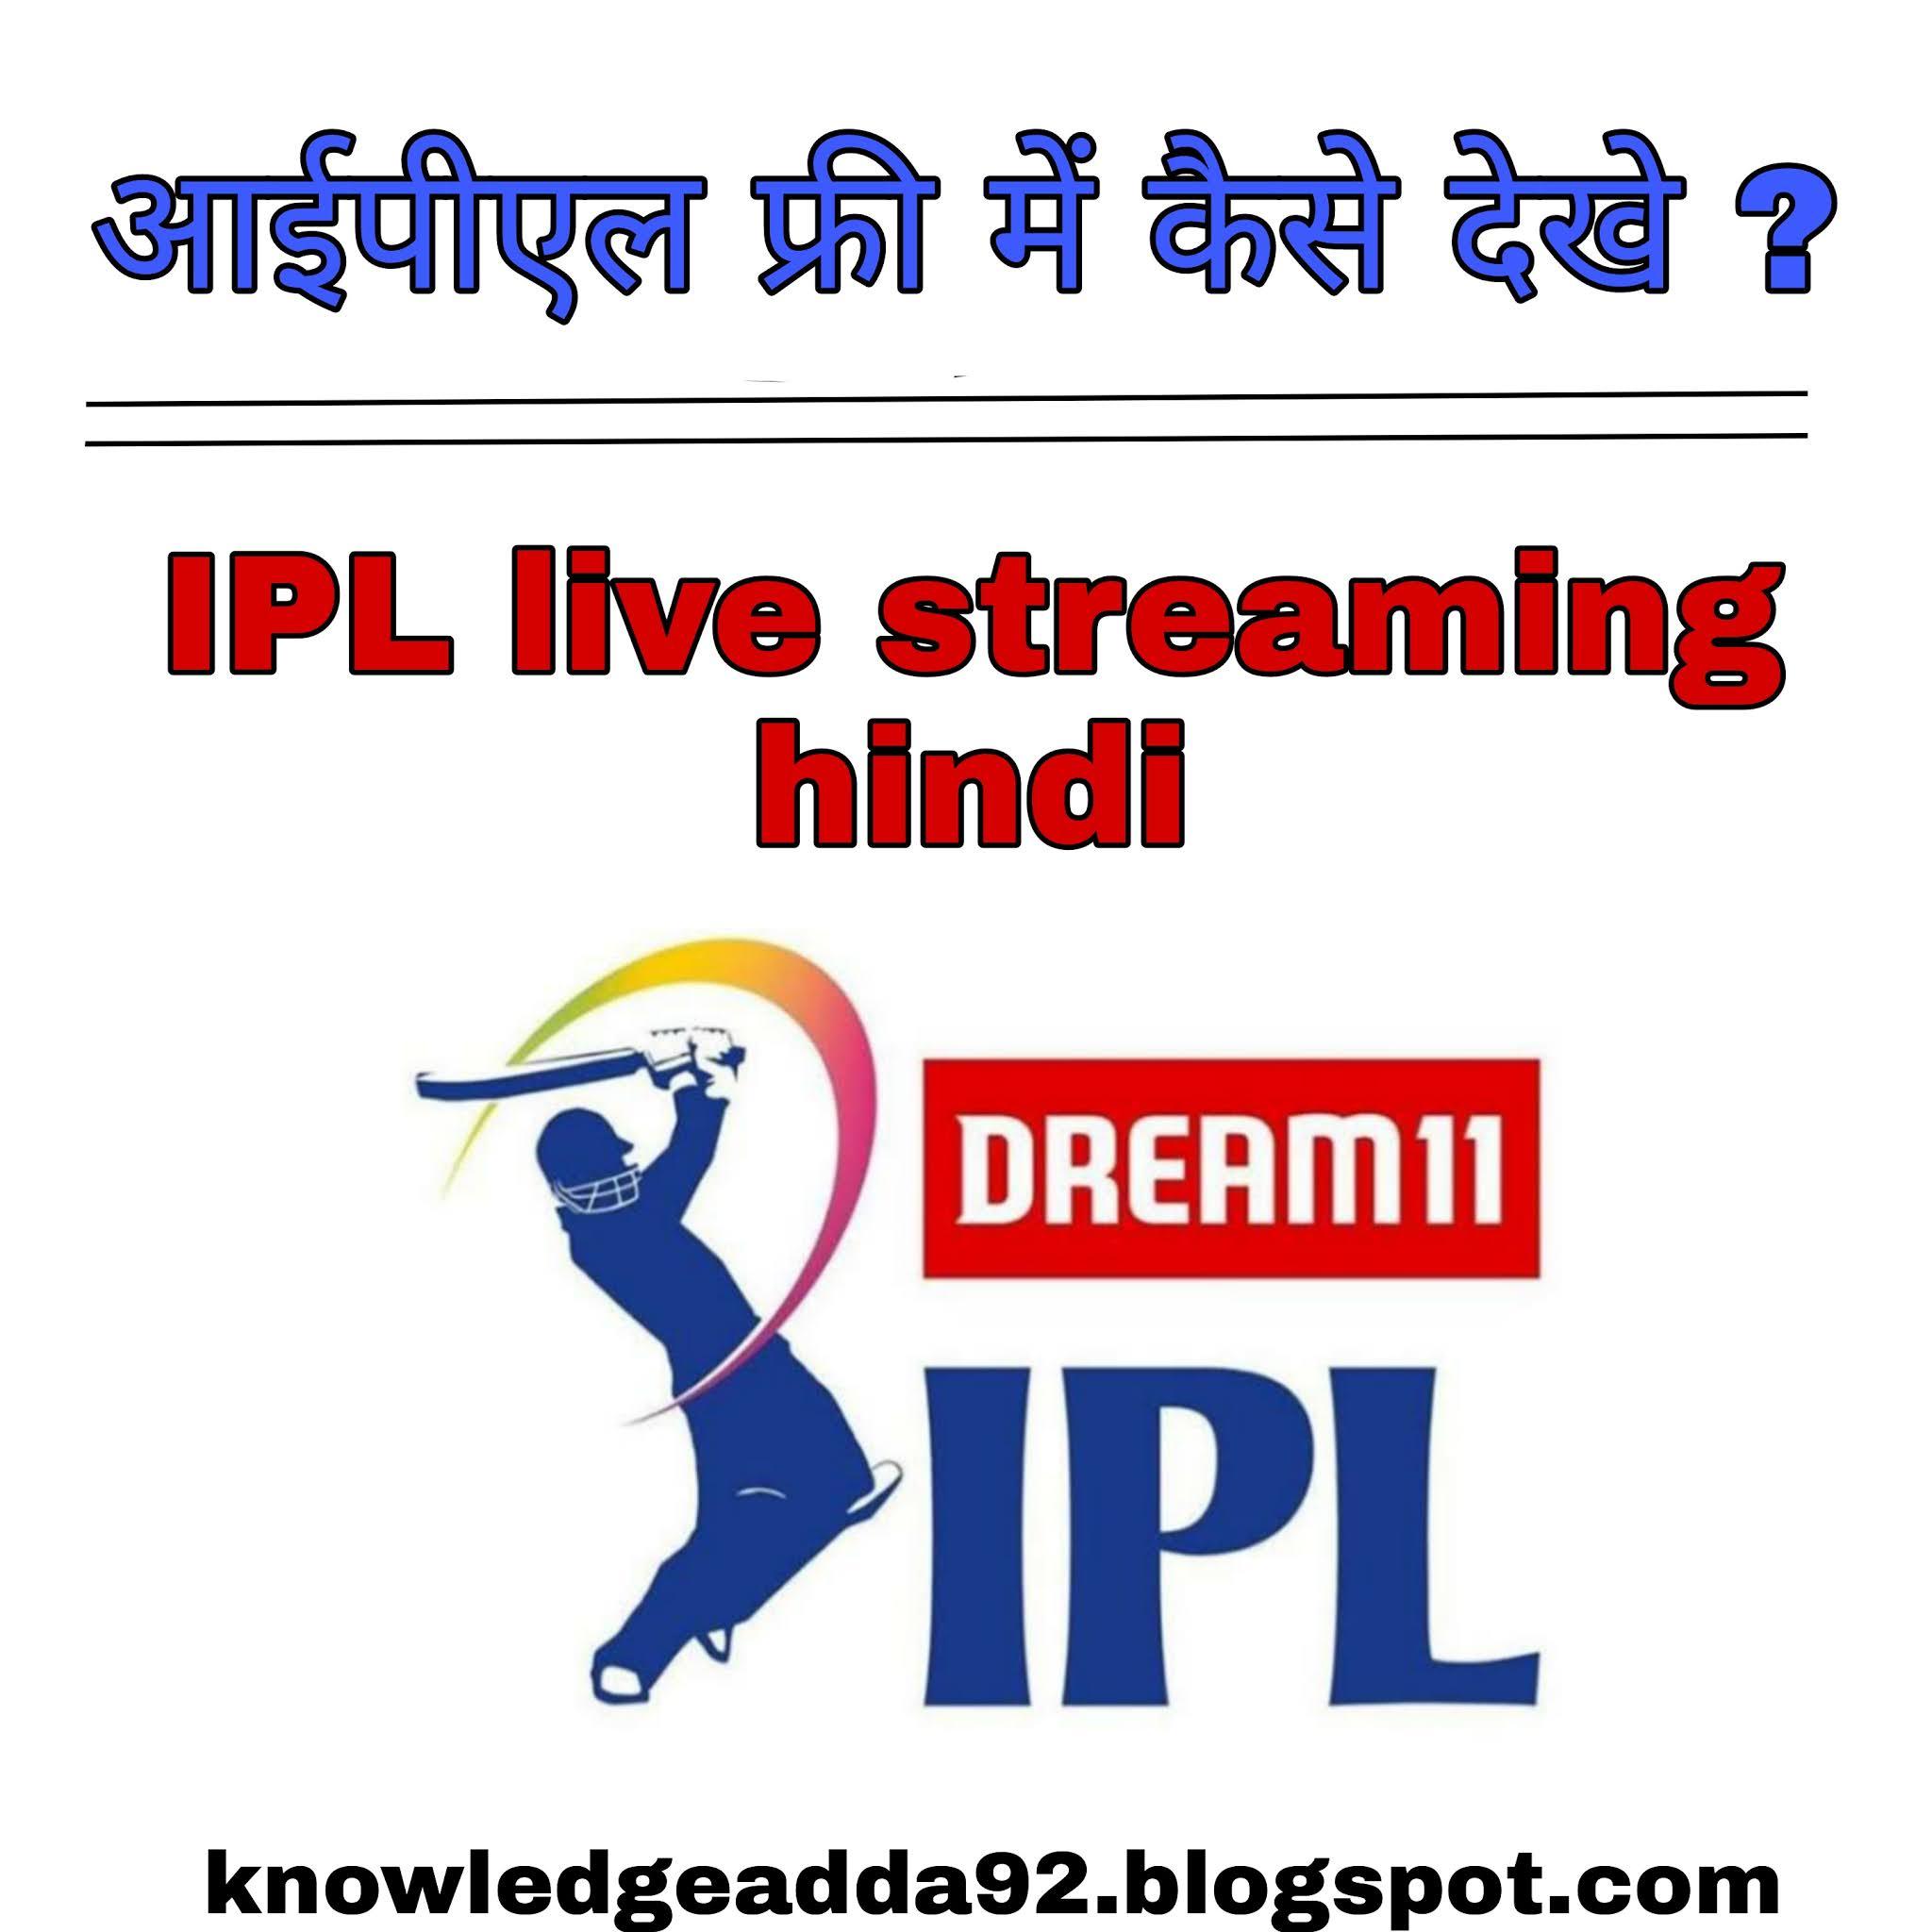 ipl live streaming hindi - Dream 11 ipl watch live